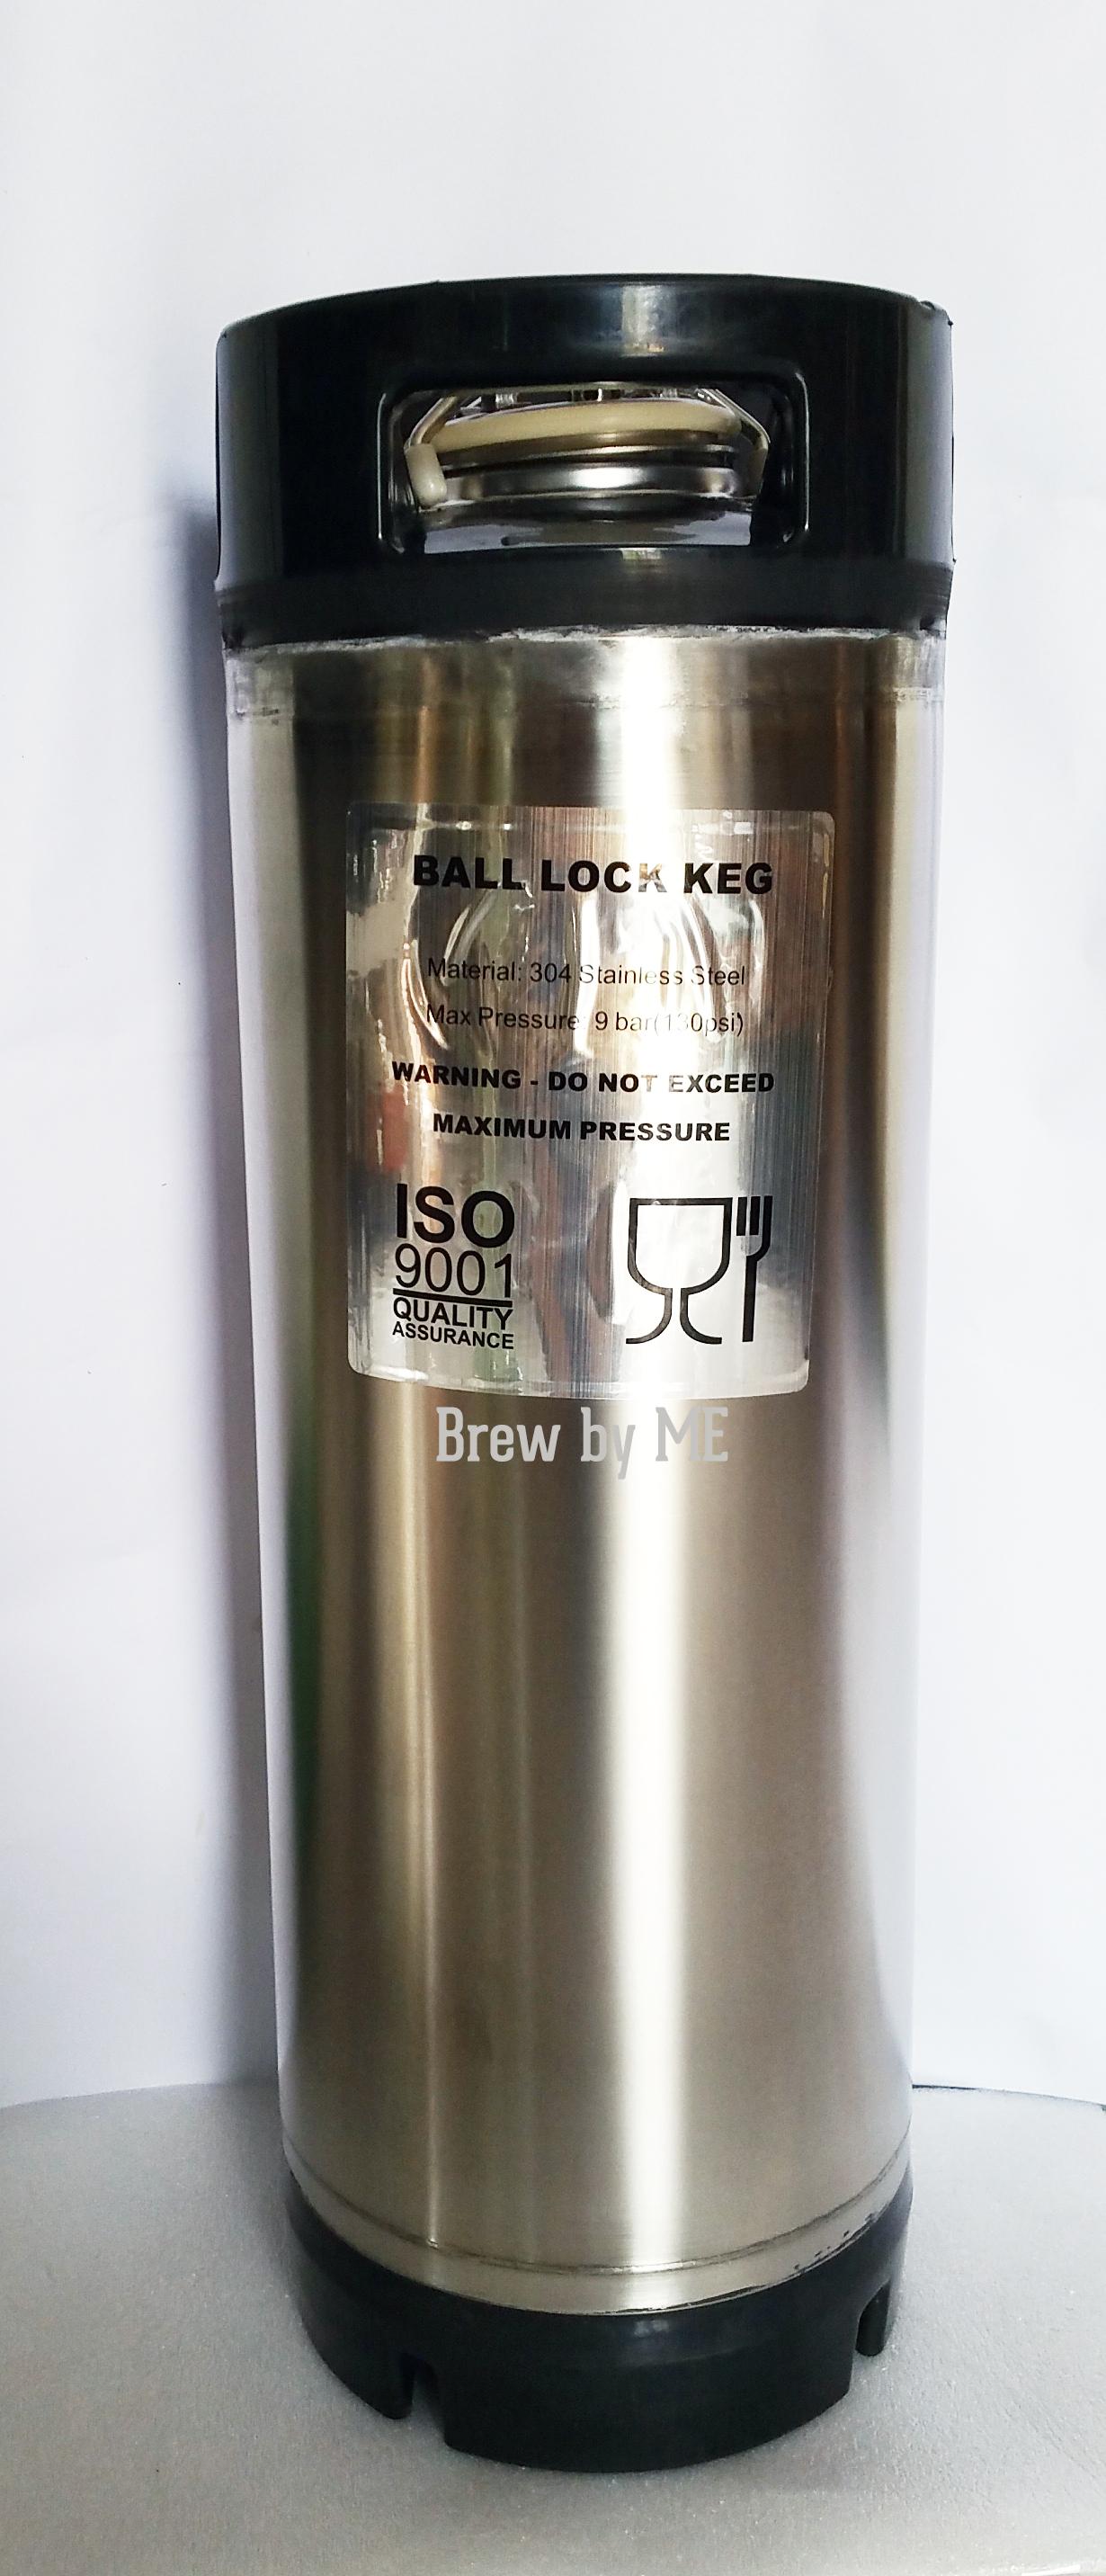 New 5 gallon Ball Lock Keg